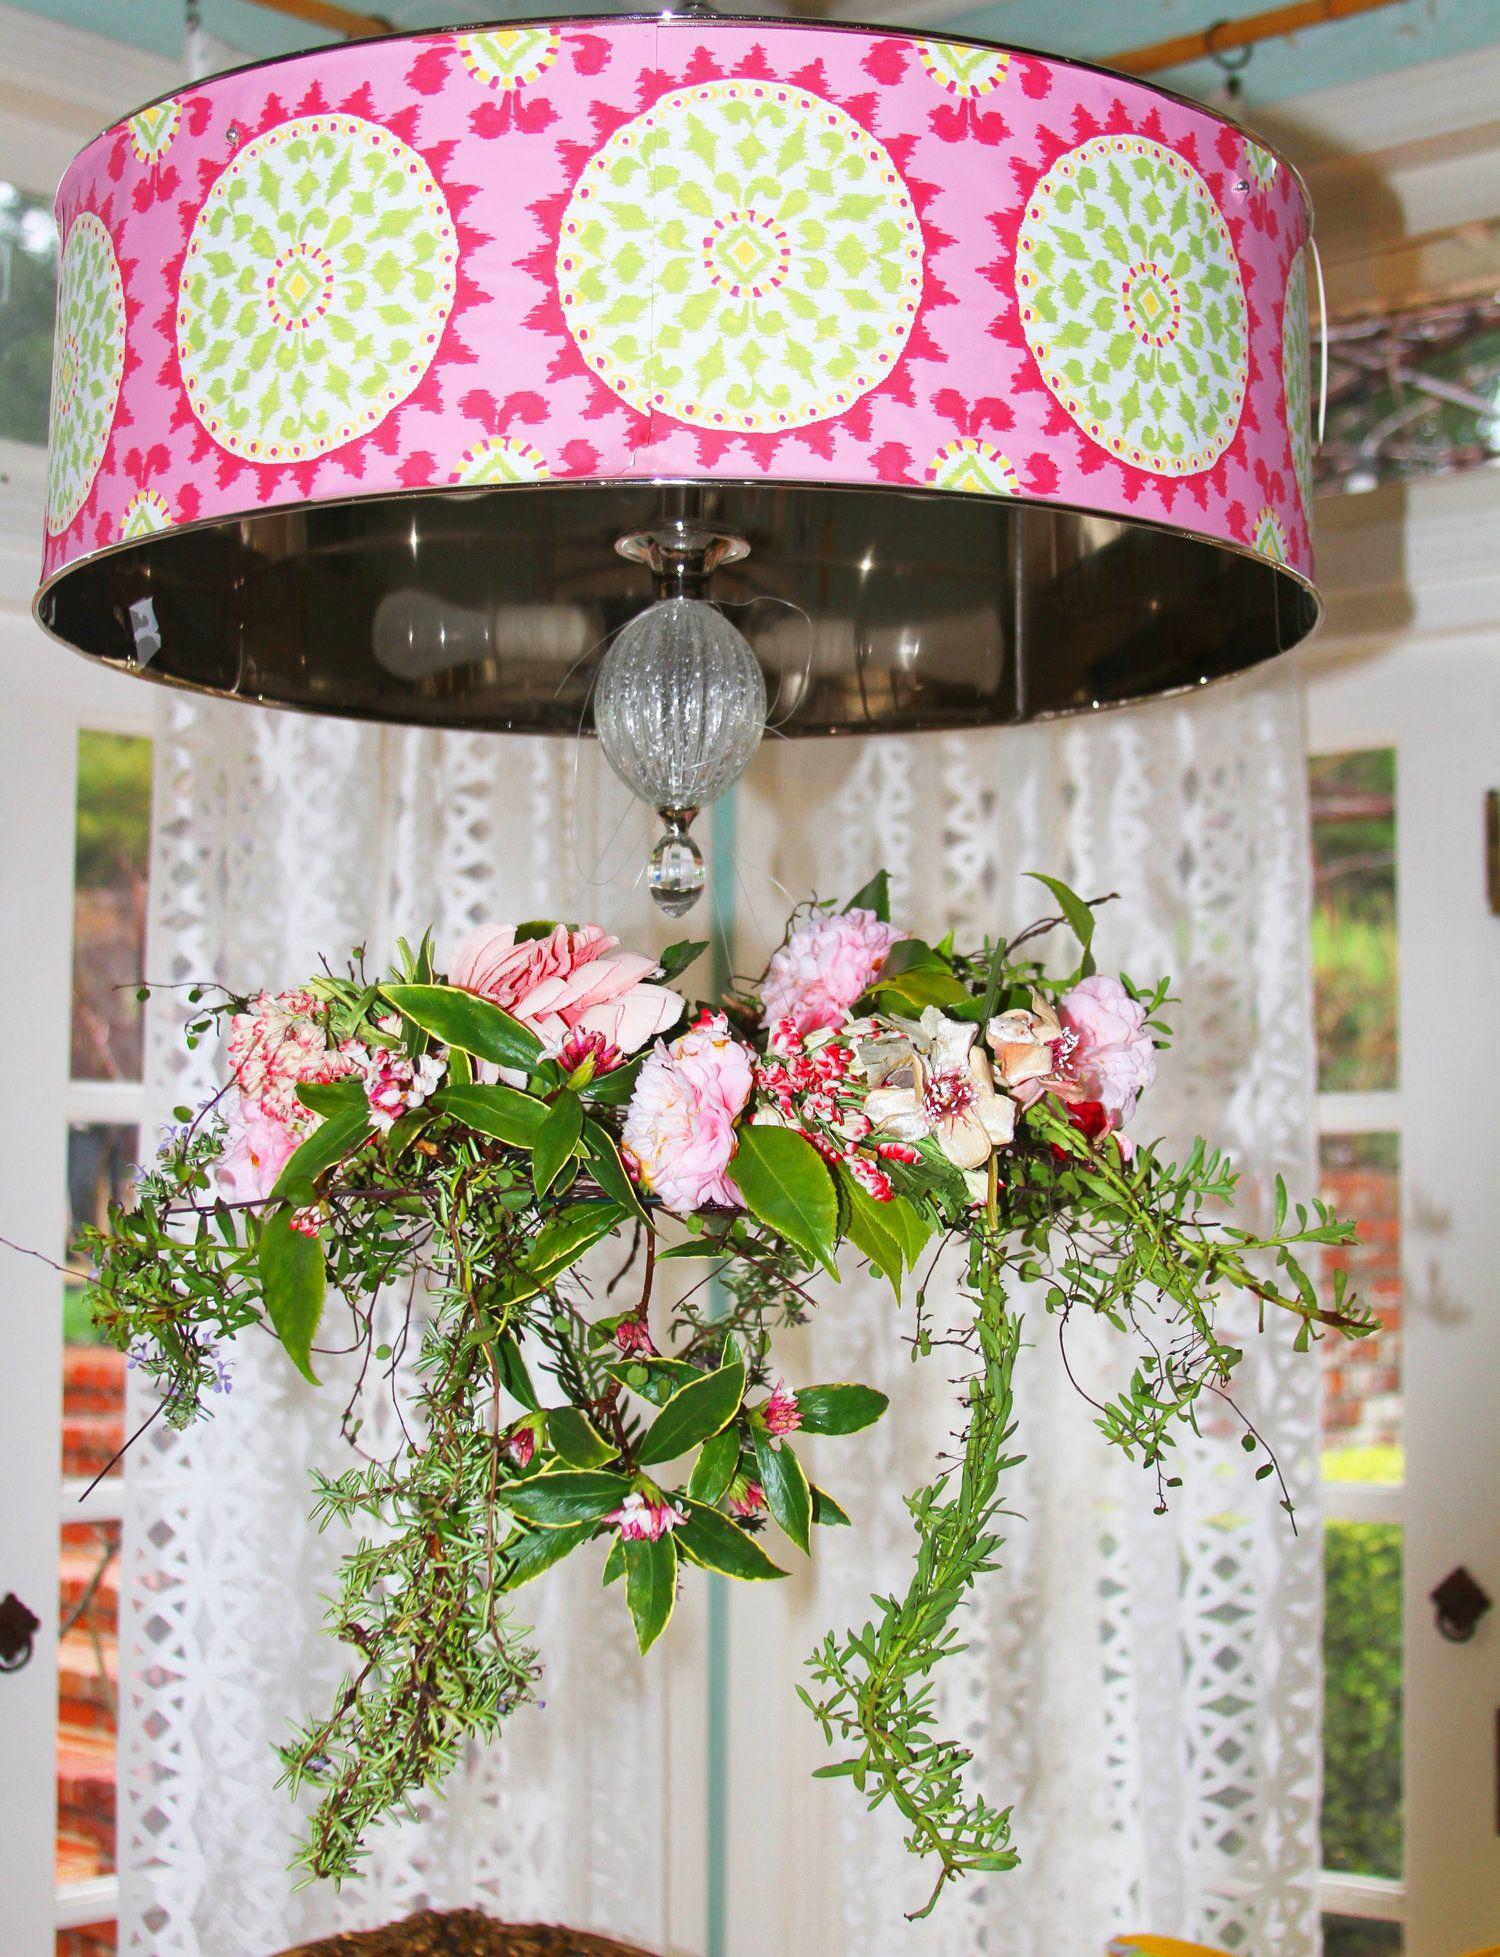 Blog dena designs diy floral chandelier on the blog blog dena designs diy floral chandelier arubaitofo Image collections